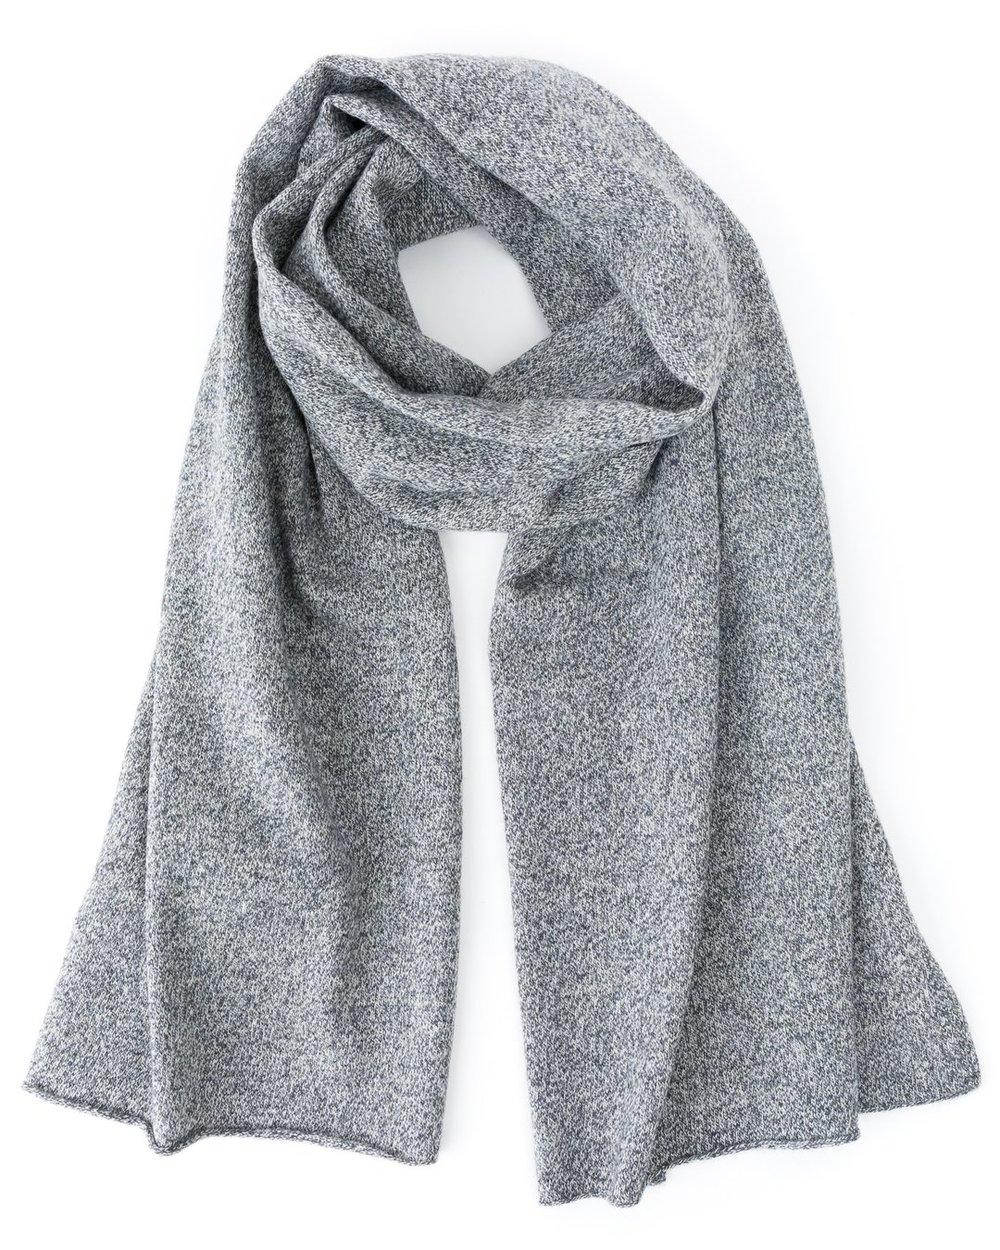 accessories-jersey-scarf-6_1080x.jpg